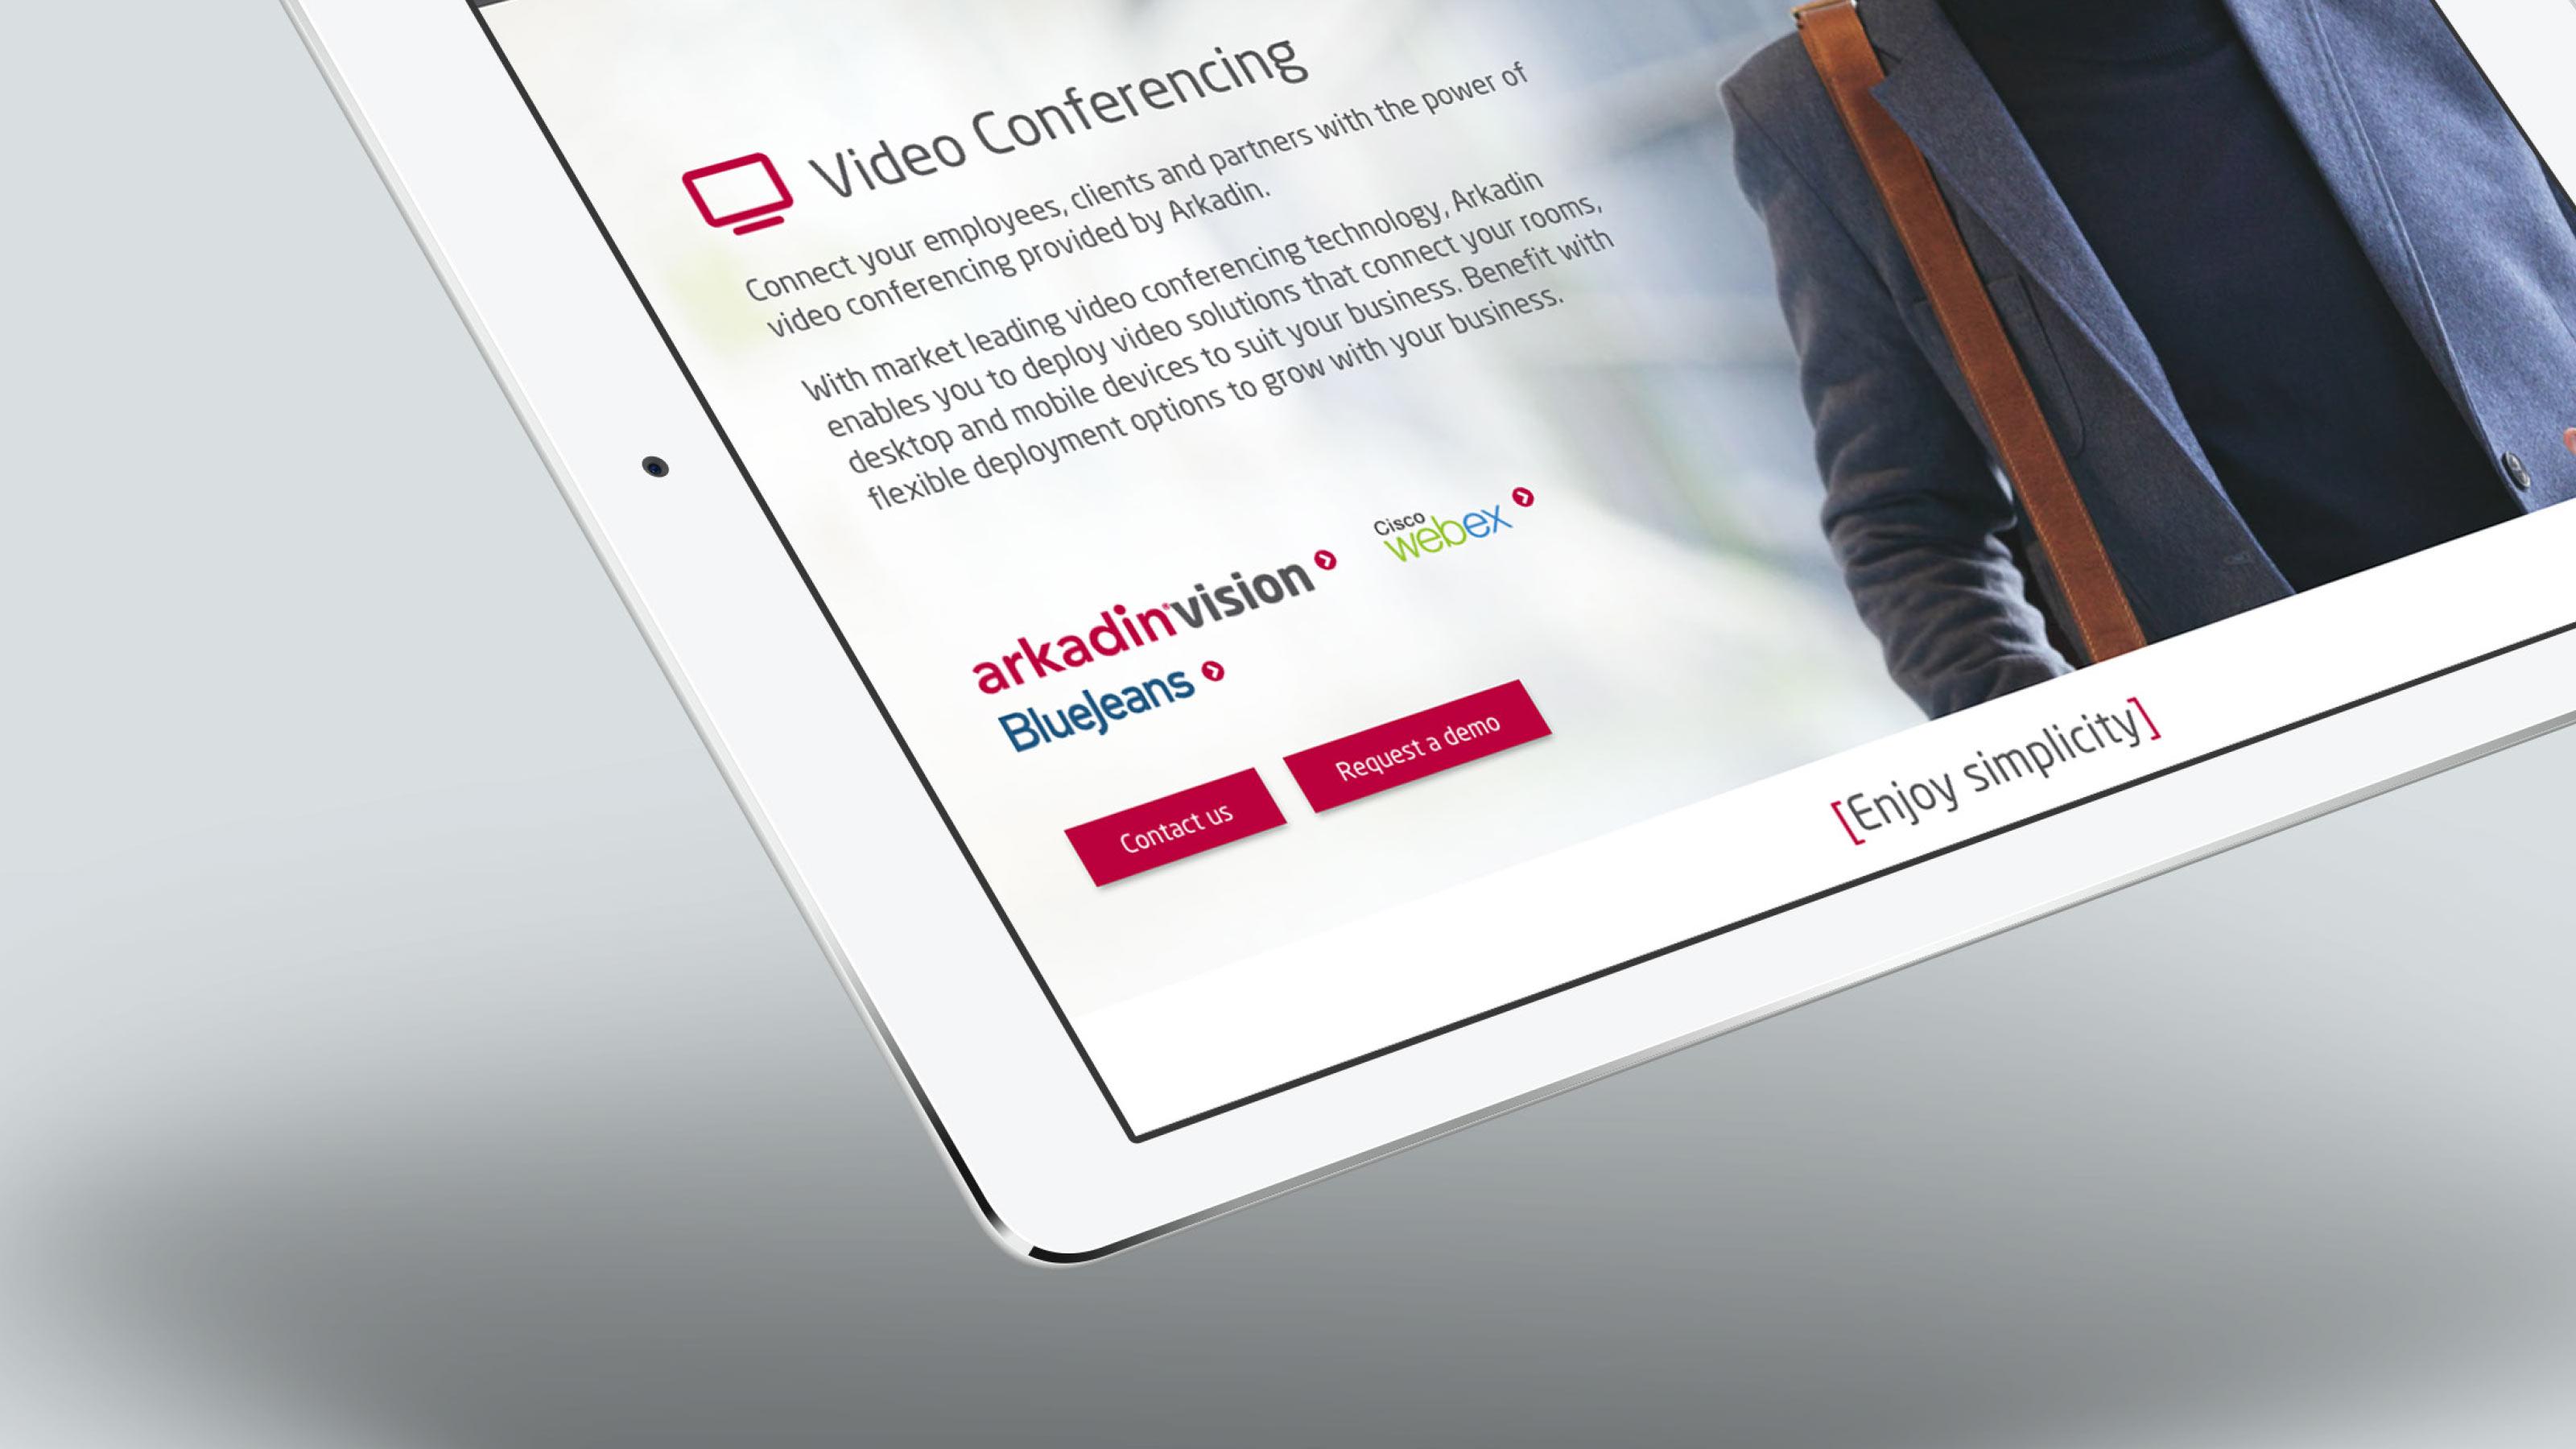 Digital tablet page Arkadin